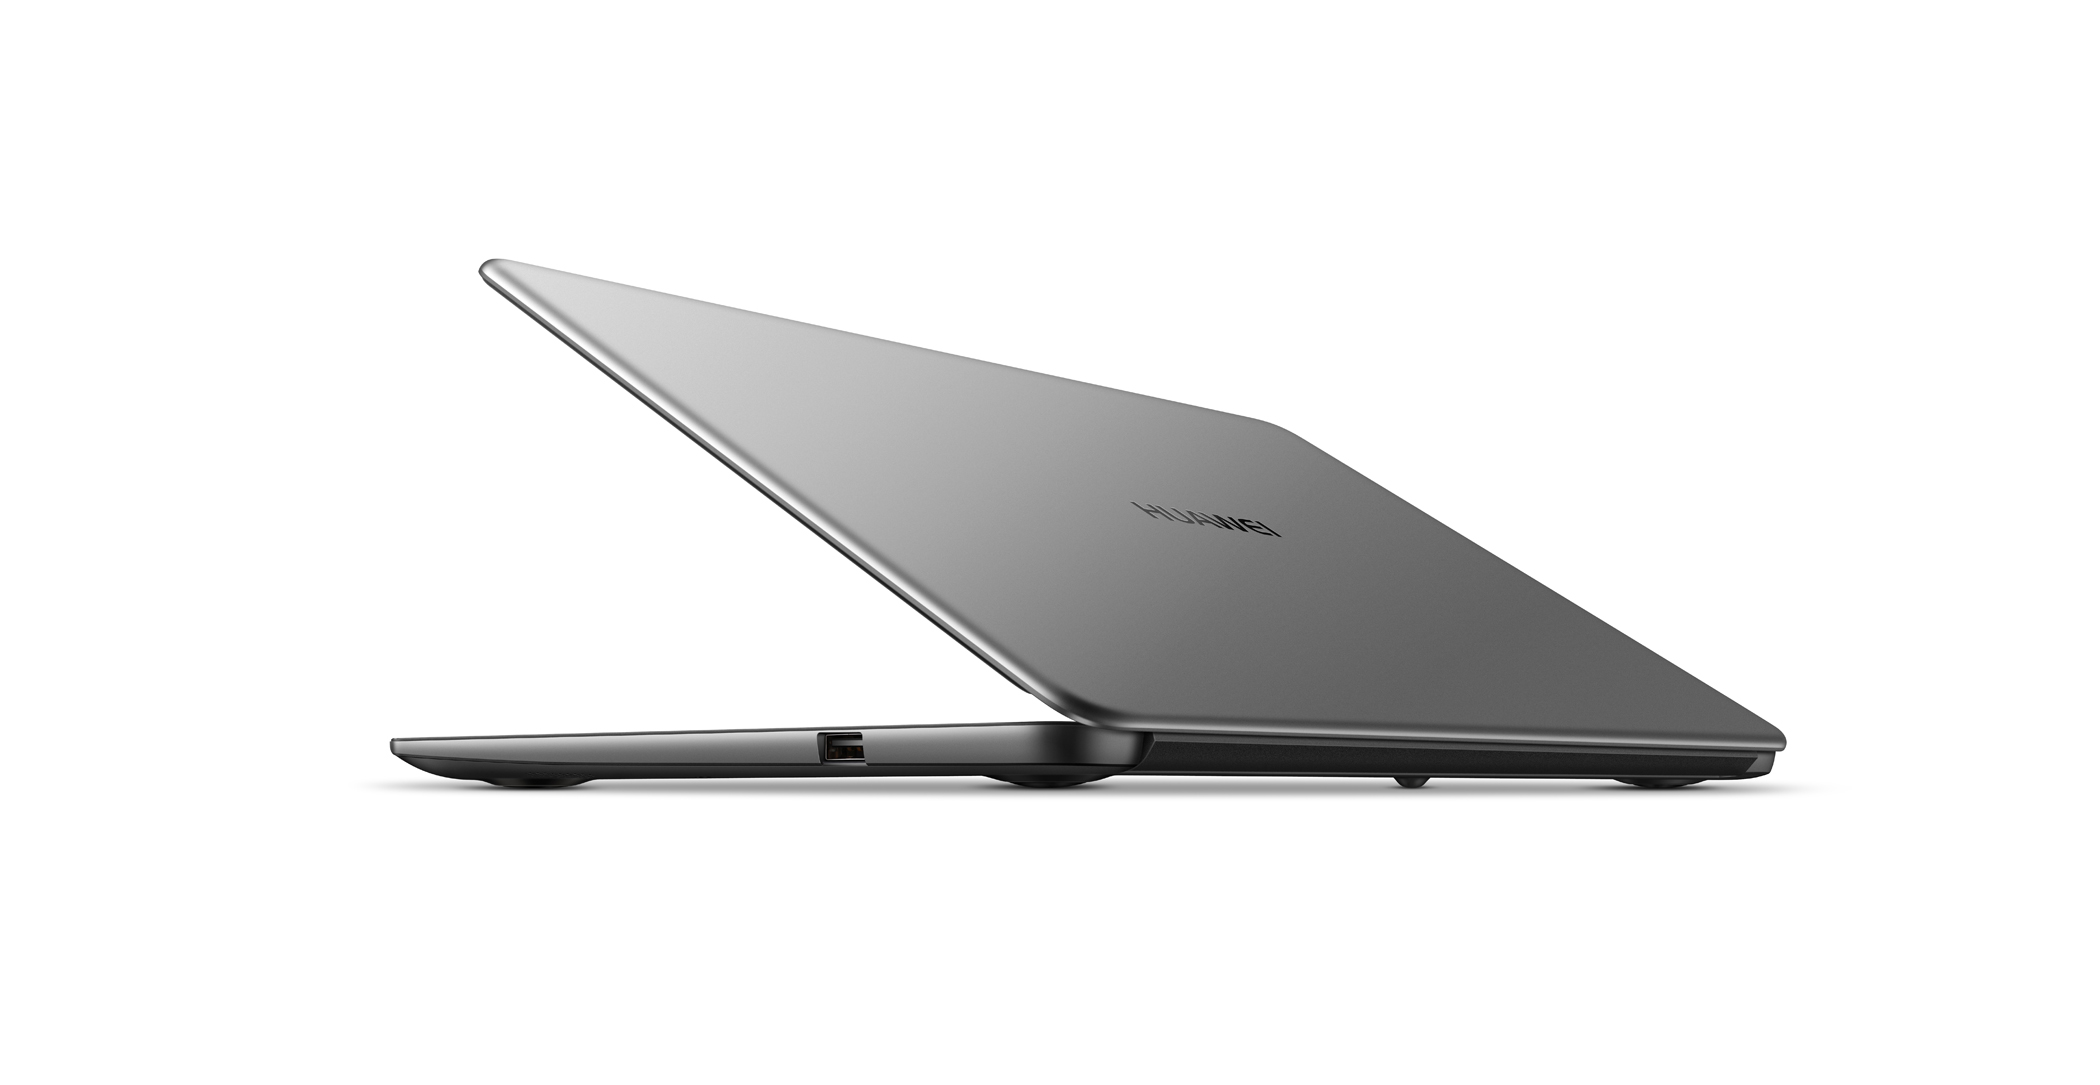 Huawei MateBook D_Space Grey-4.jpg